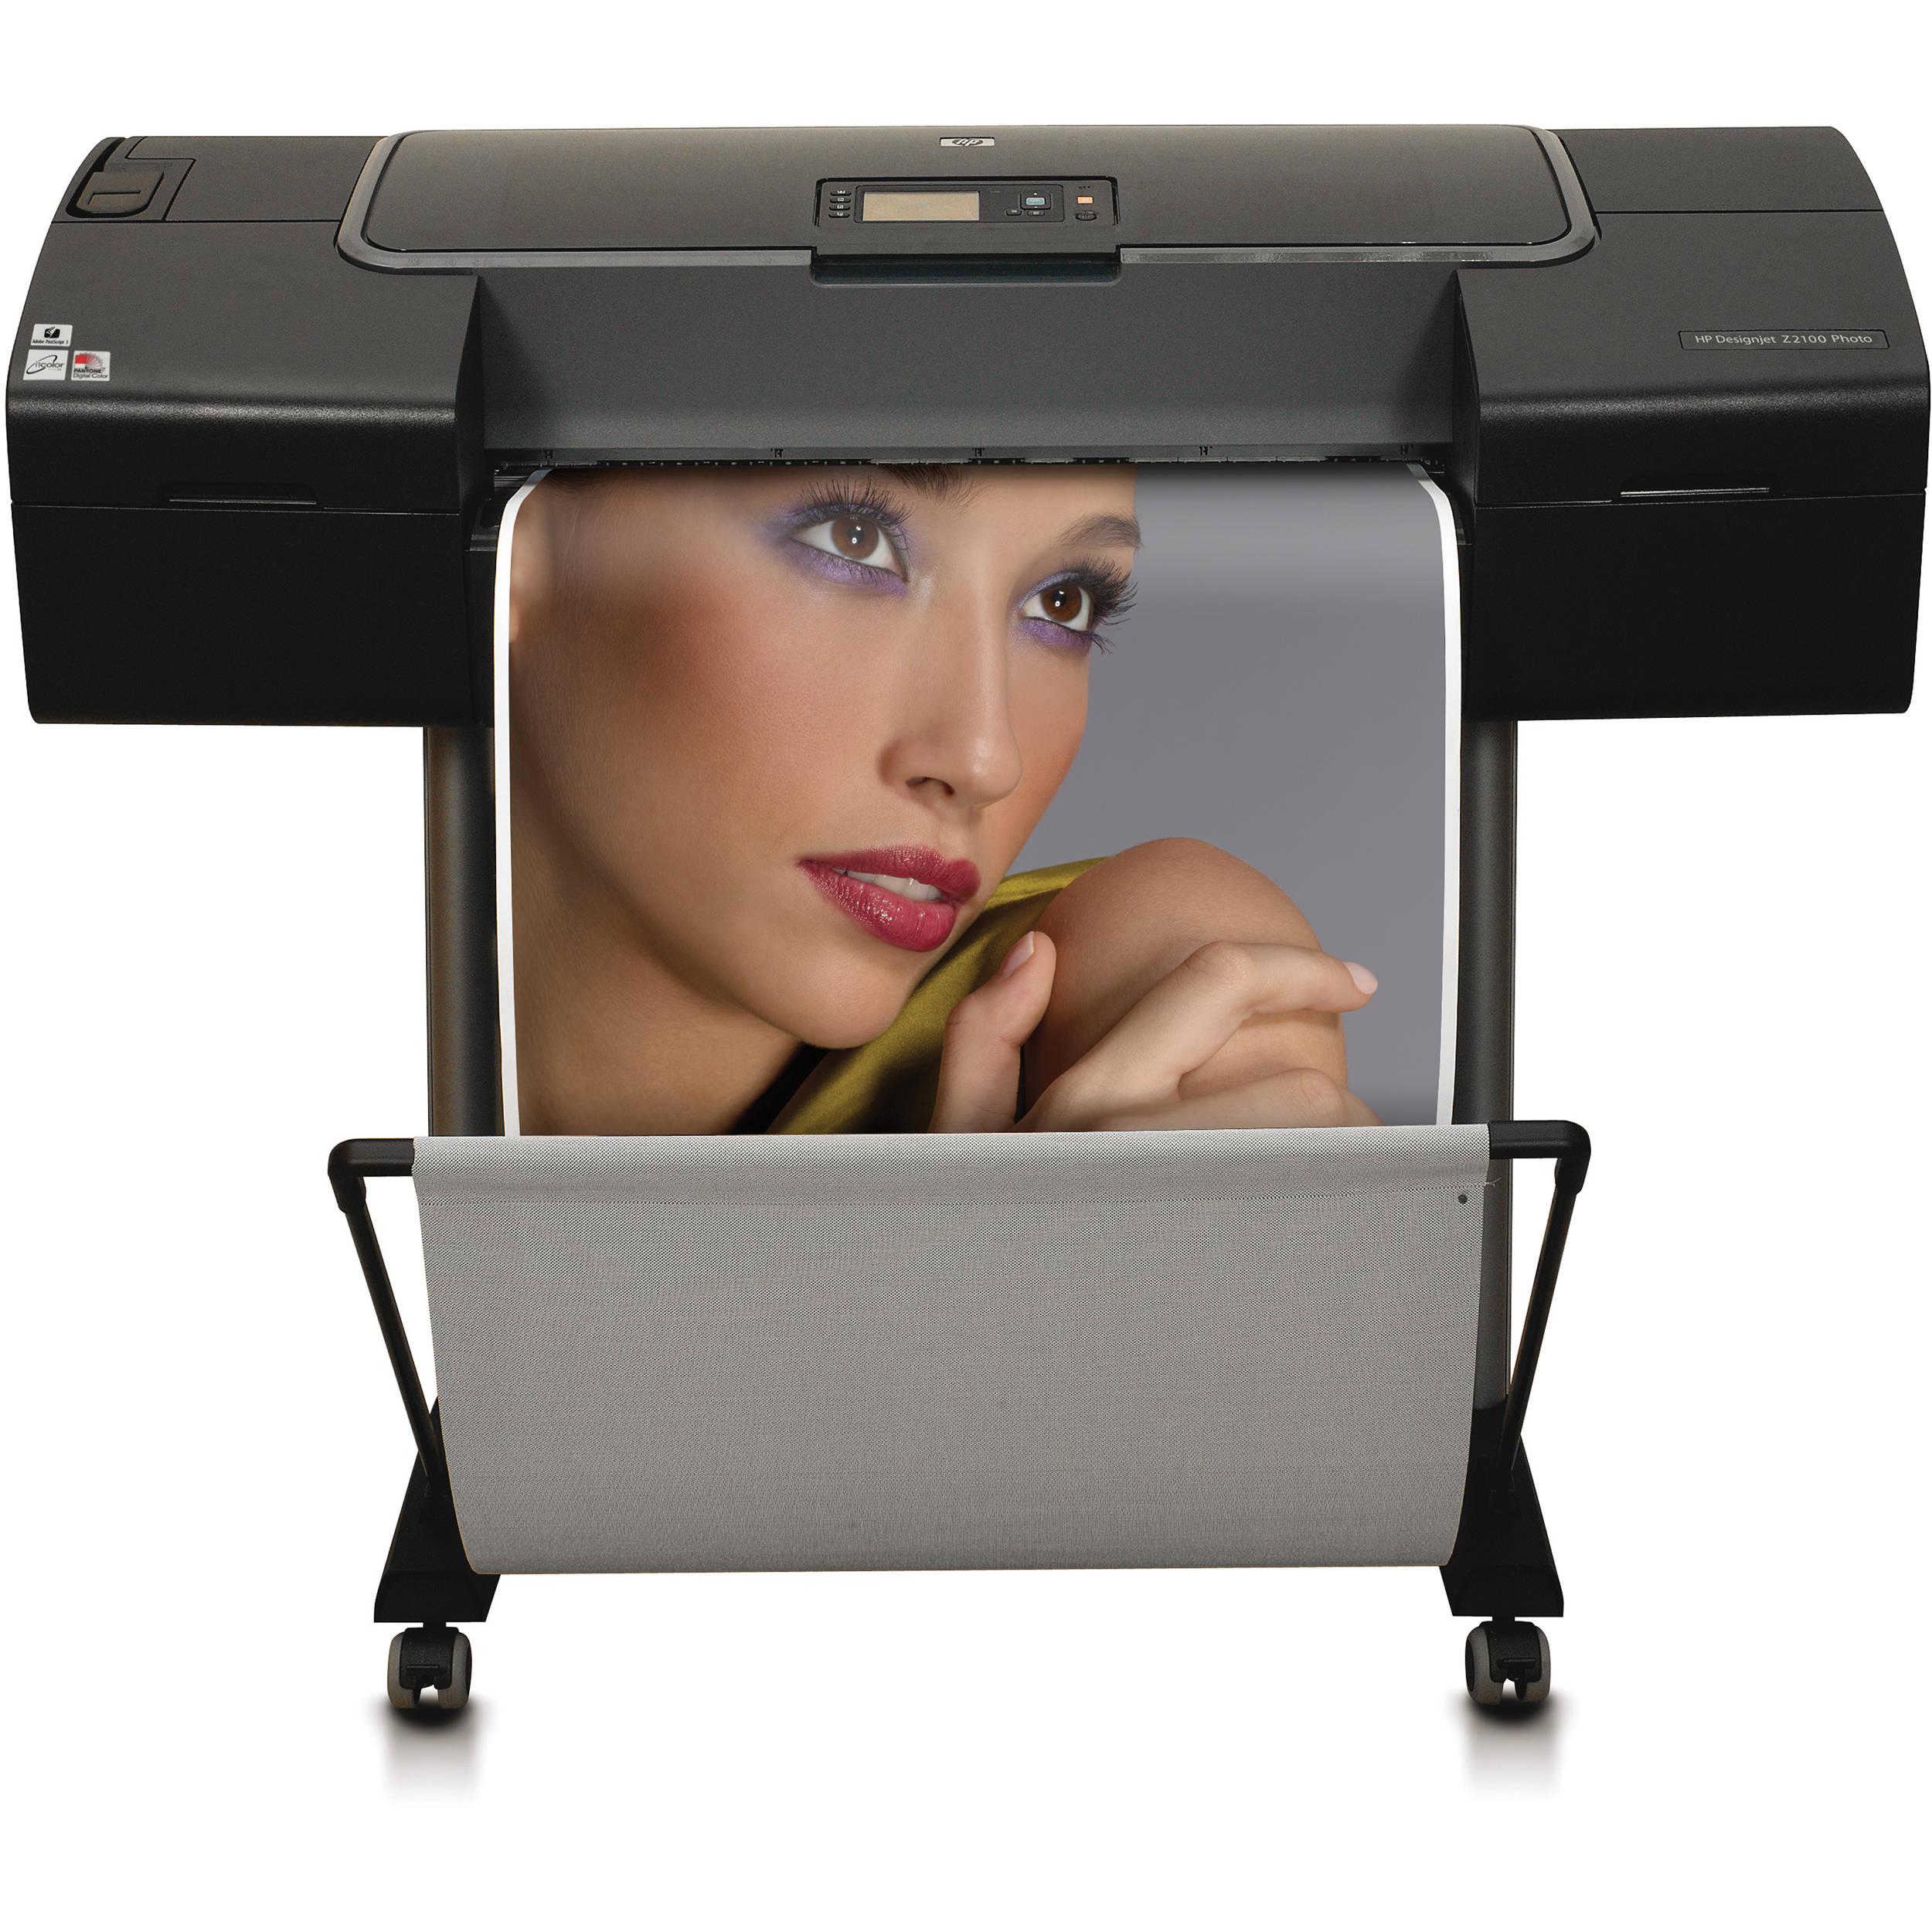 HP DesignJet Z2100 Photo Printer HP Official Site Hp designjet z2100 photo printer series